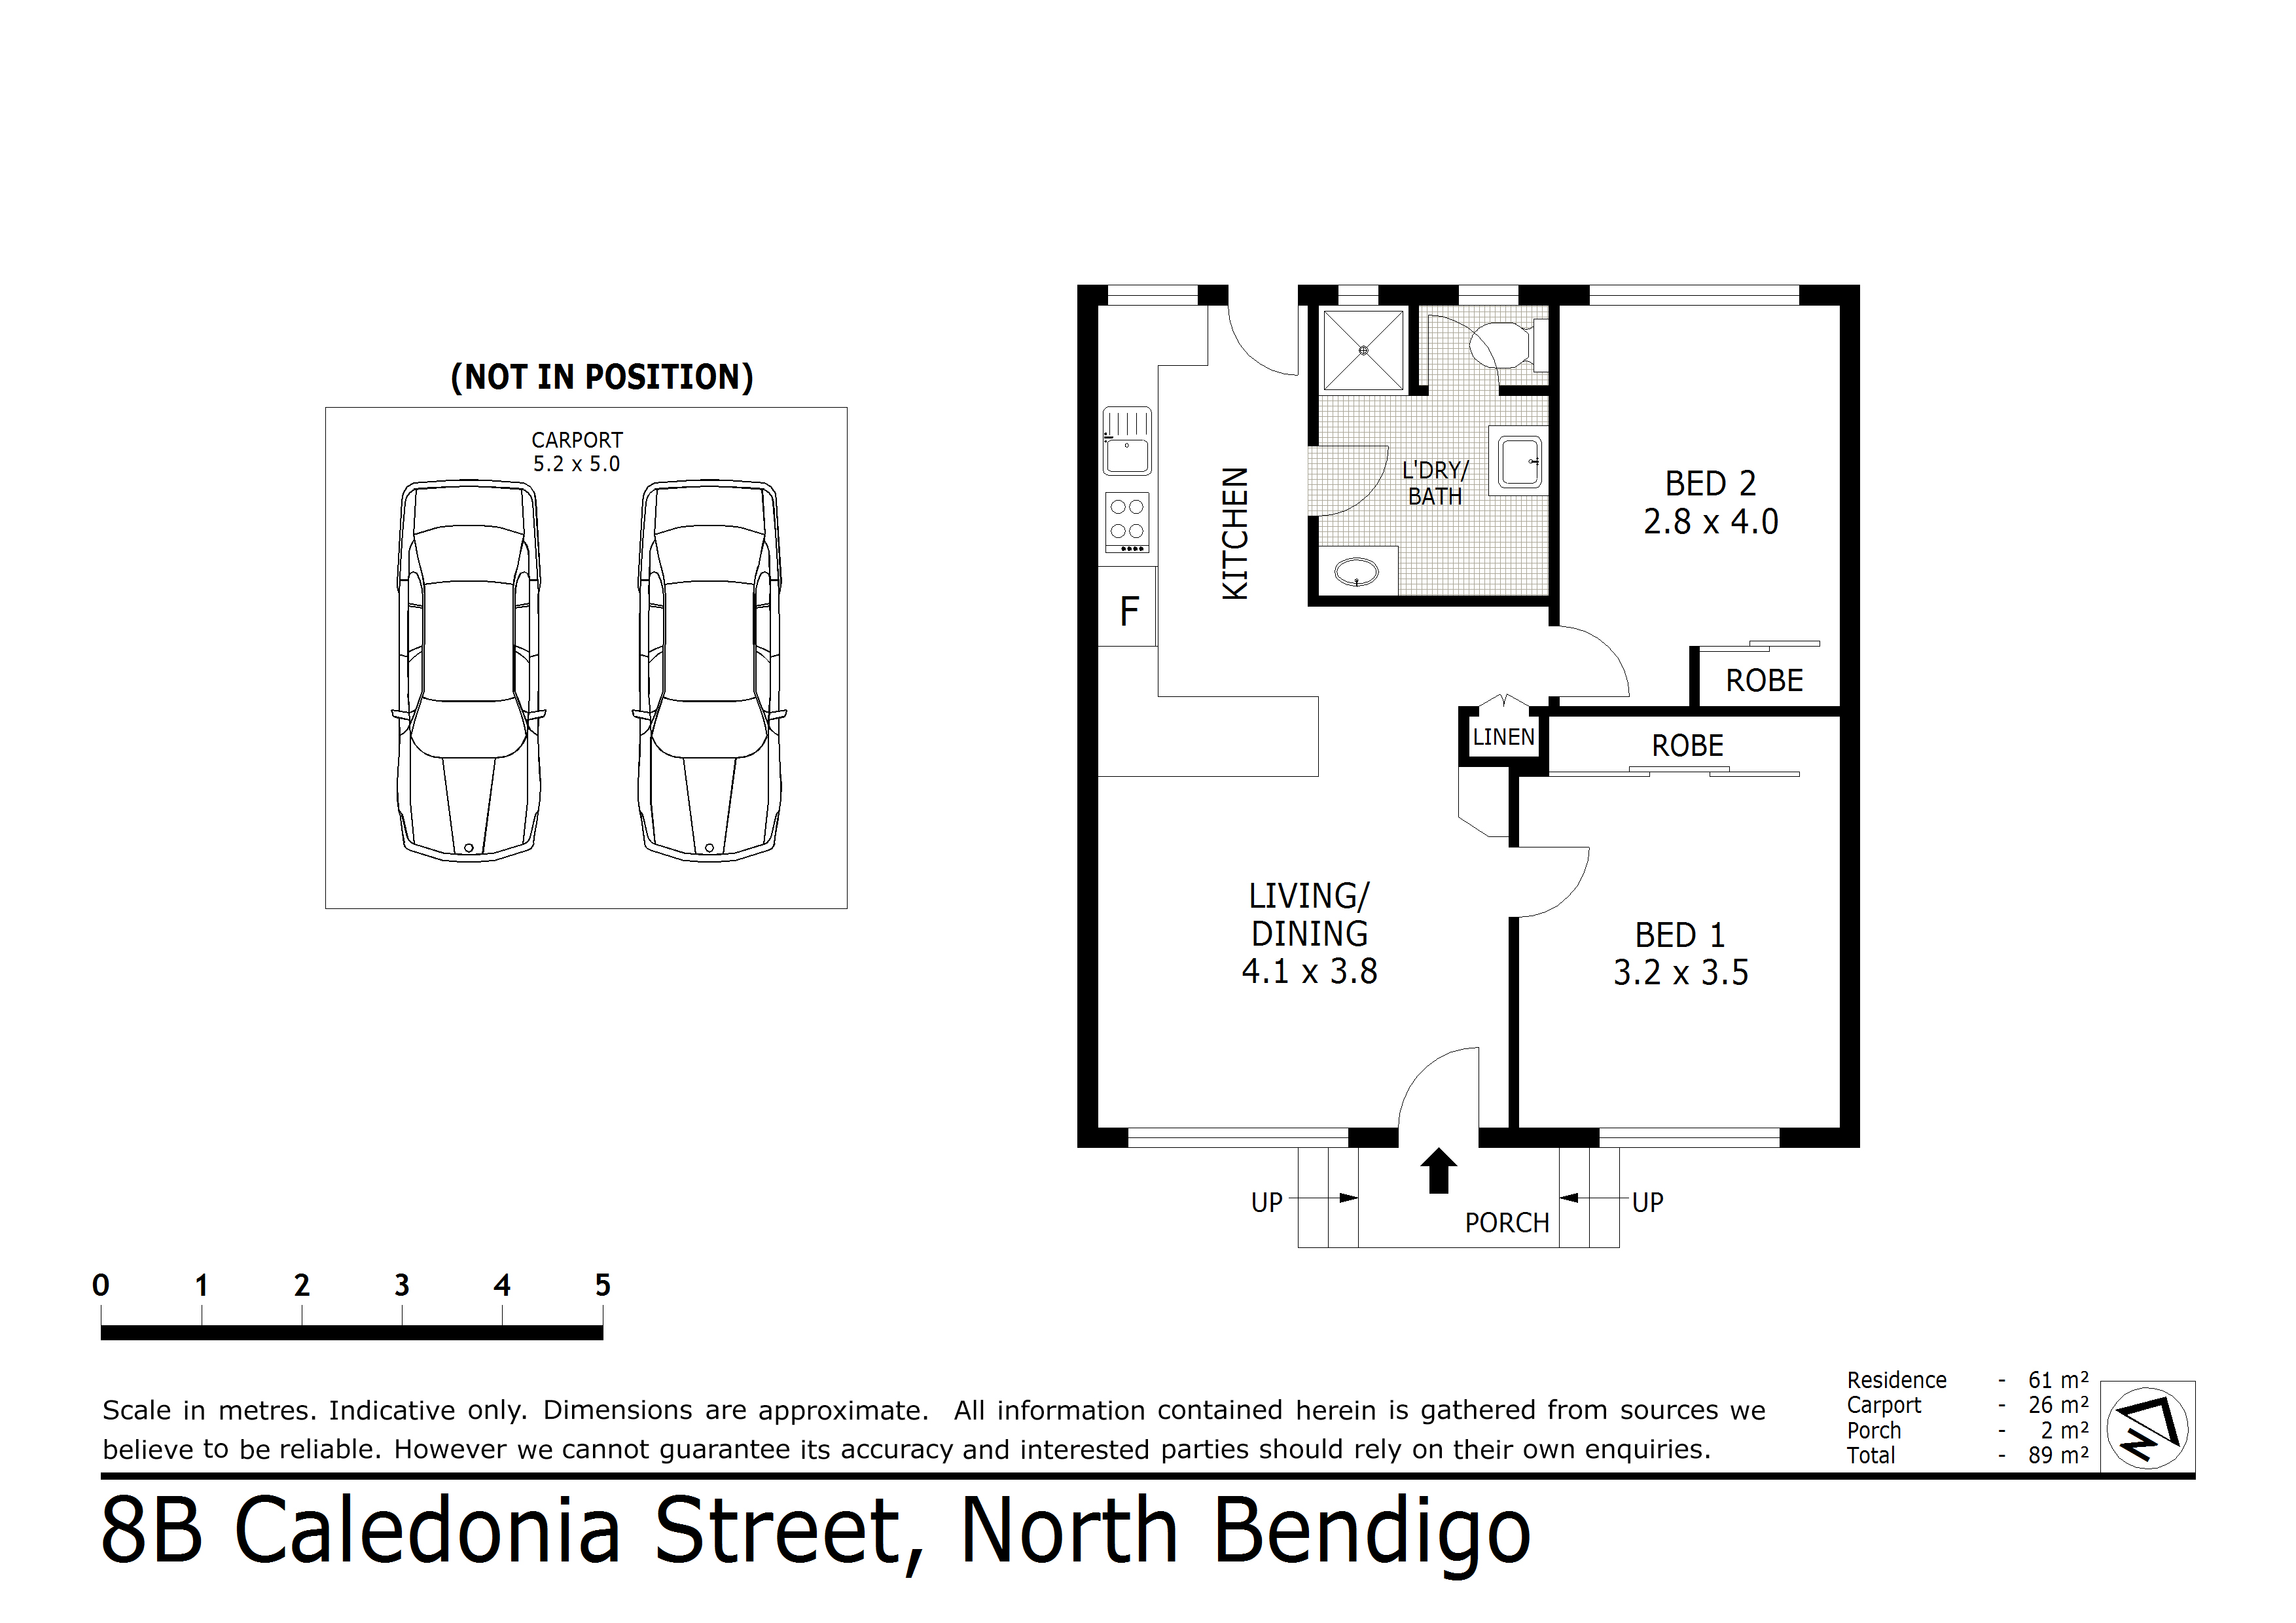 8B Caledonia Street, North Bendigo, VIC 3550